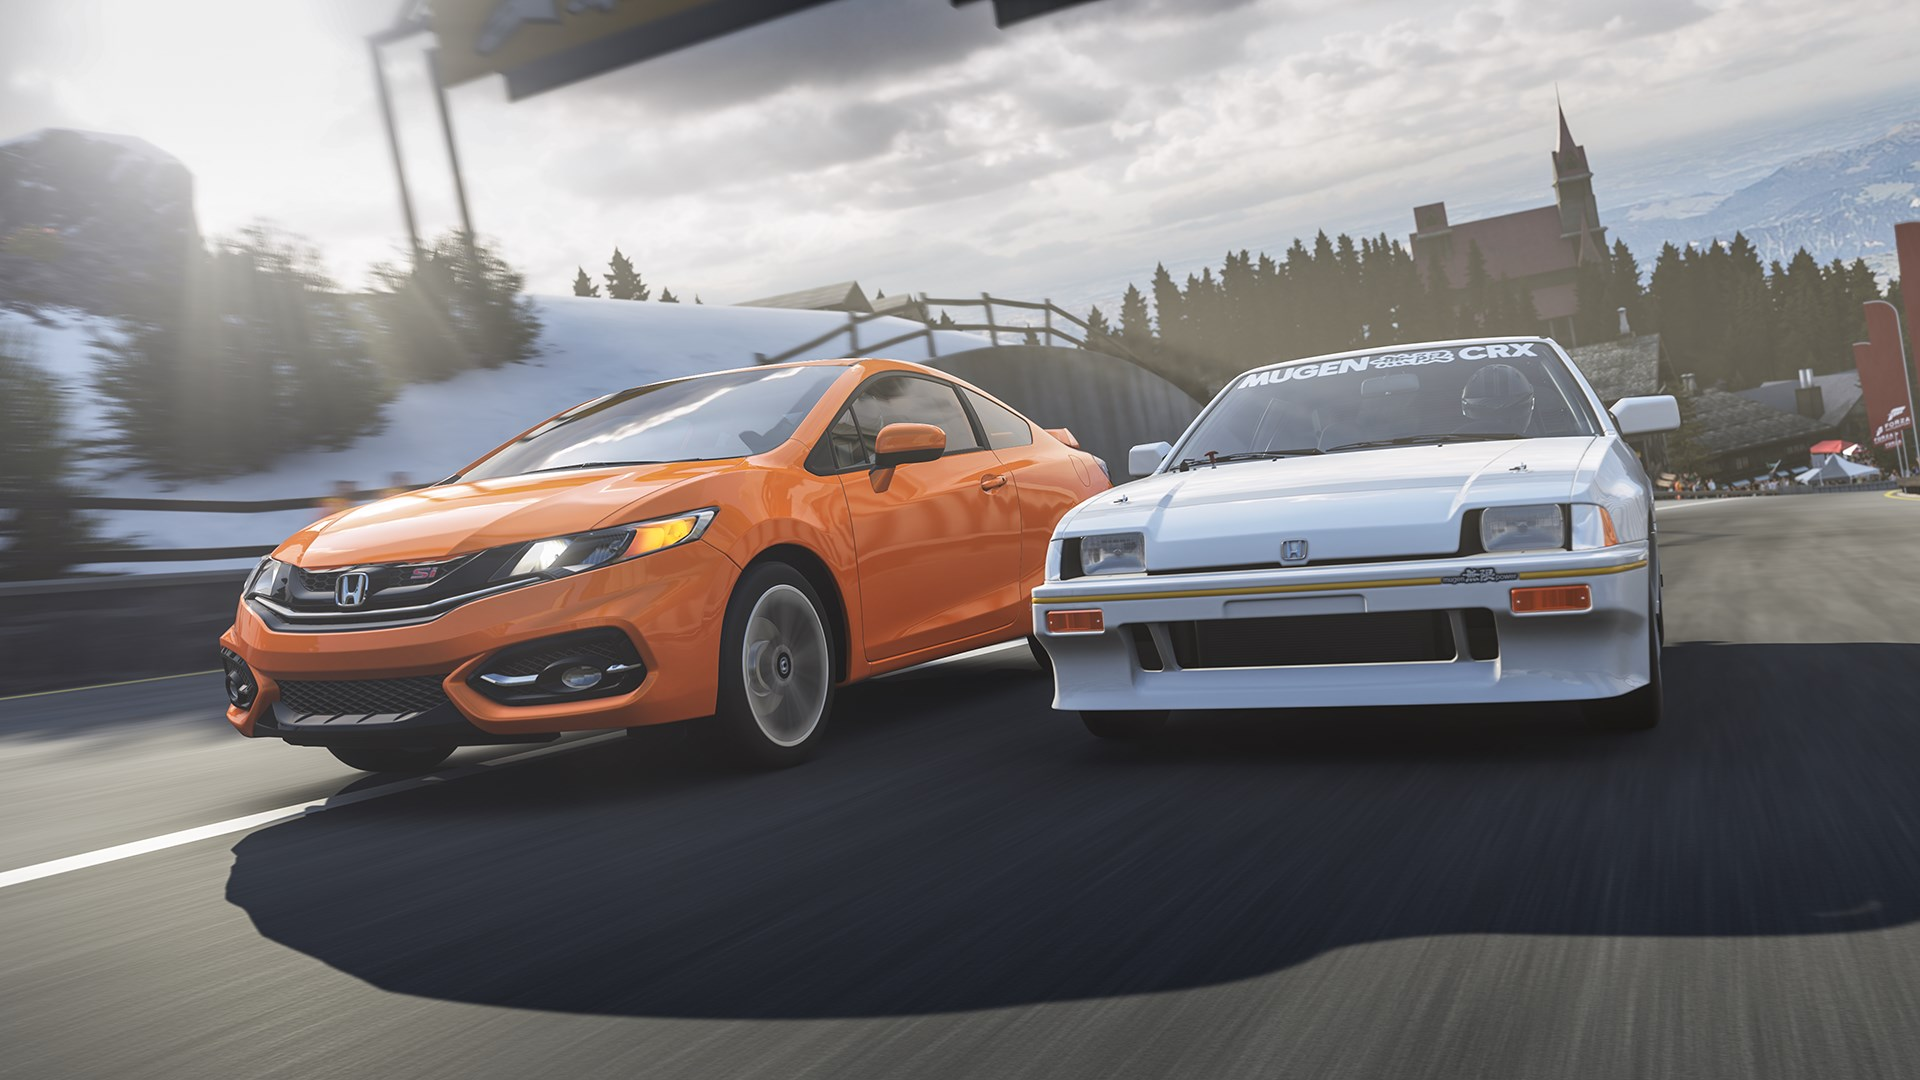 Forza Motorsport 5 Honda Legends Car Pack